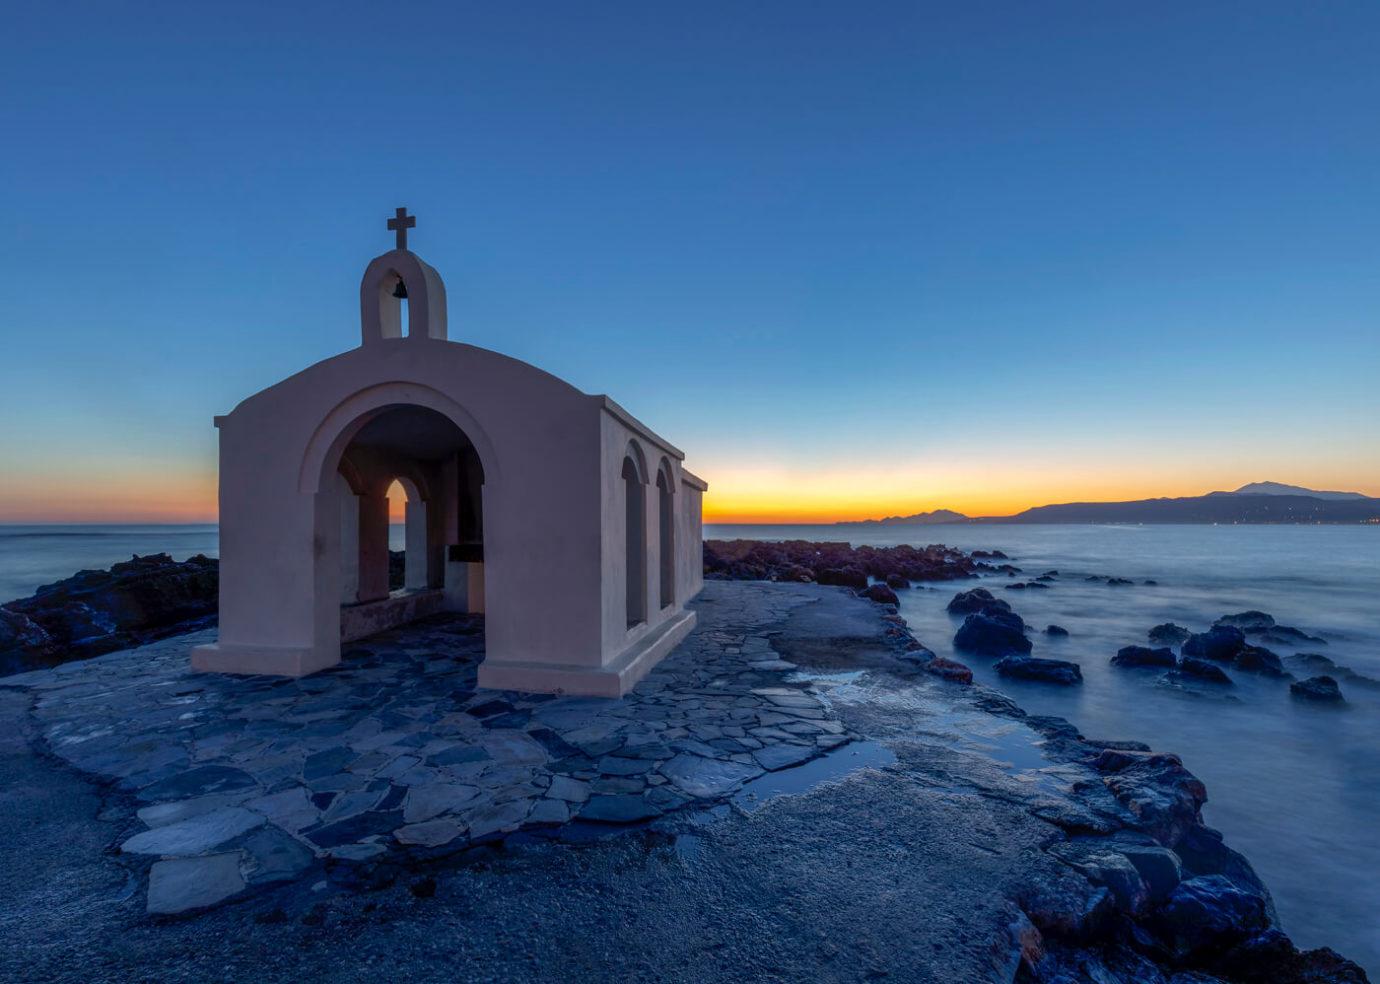 Chapel of St. Nicholas, Crete